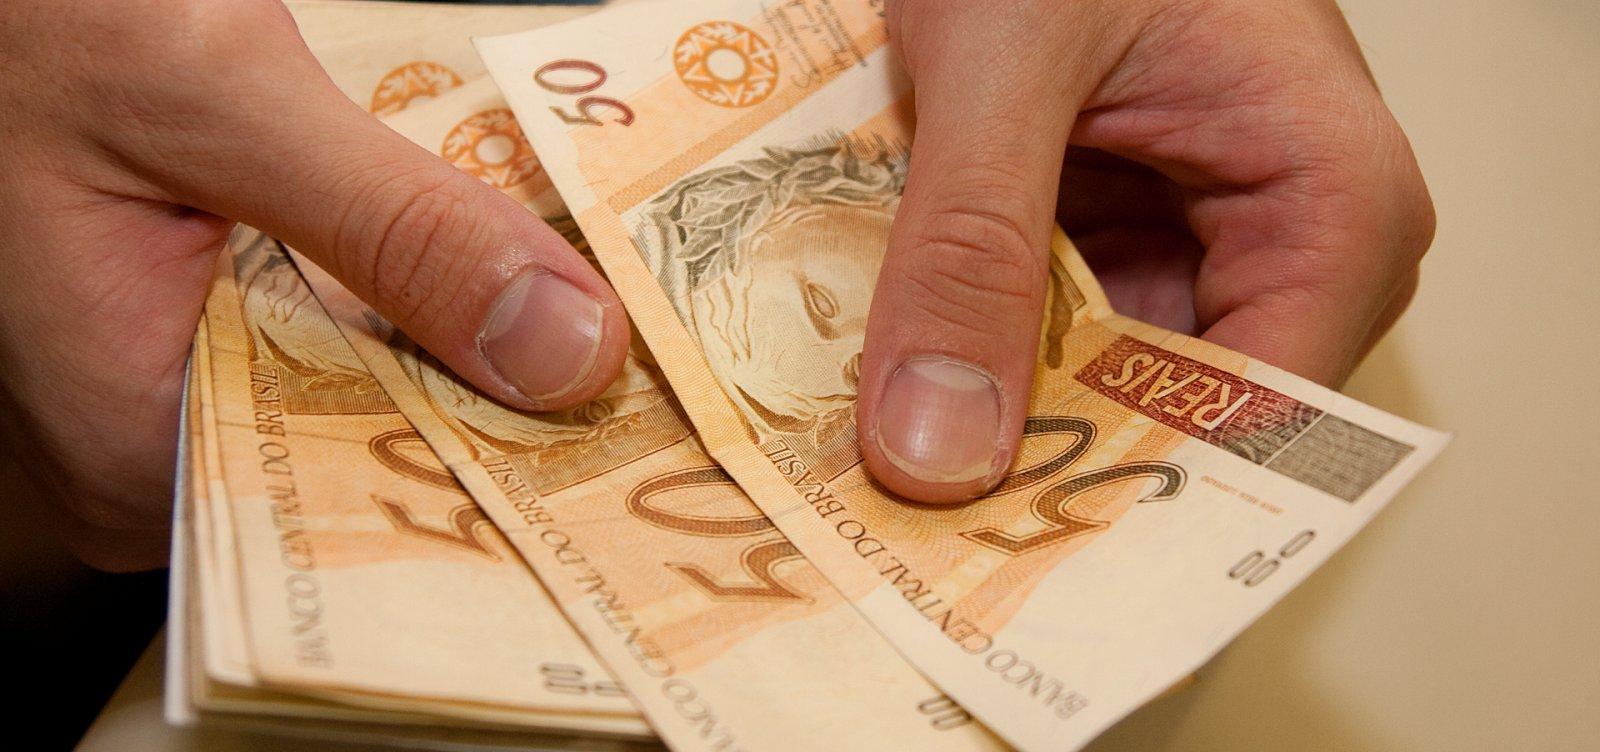 [Diferença salarial entre pobres e ricos é recorde, aponta IBGE]